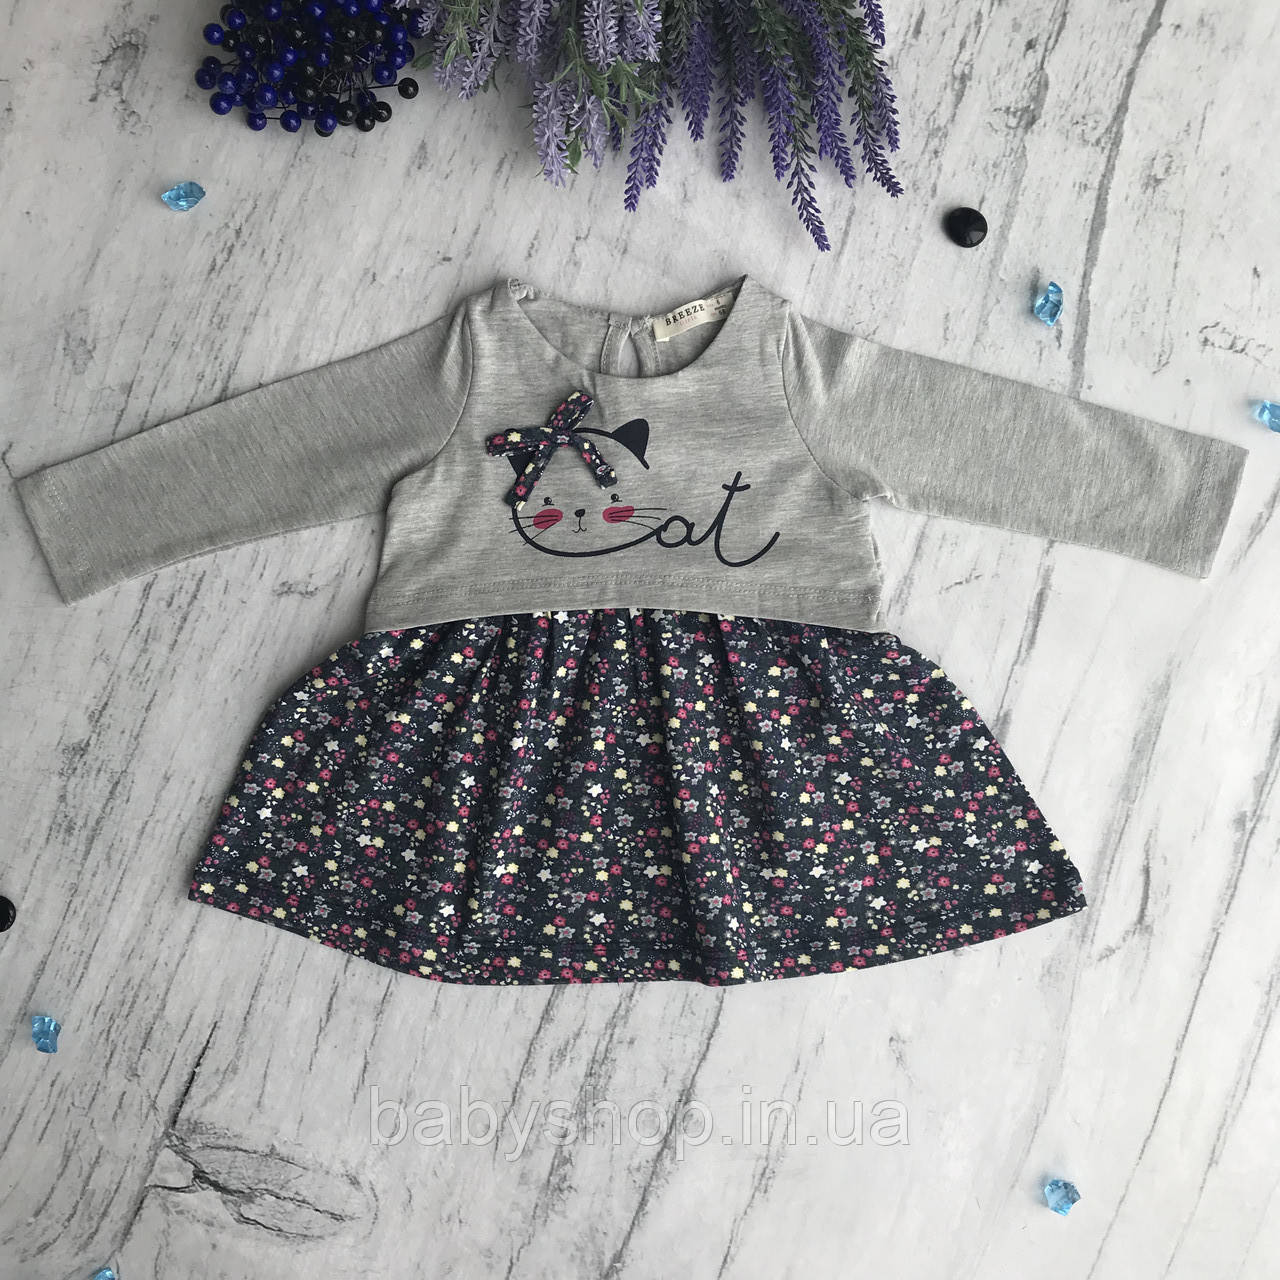 Платье на девочку Breeze 12-а. Размер 68 см, 74 см, 80 см, 92 см